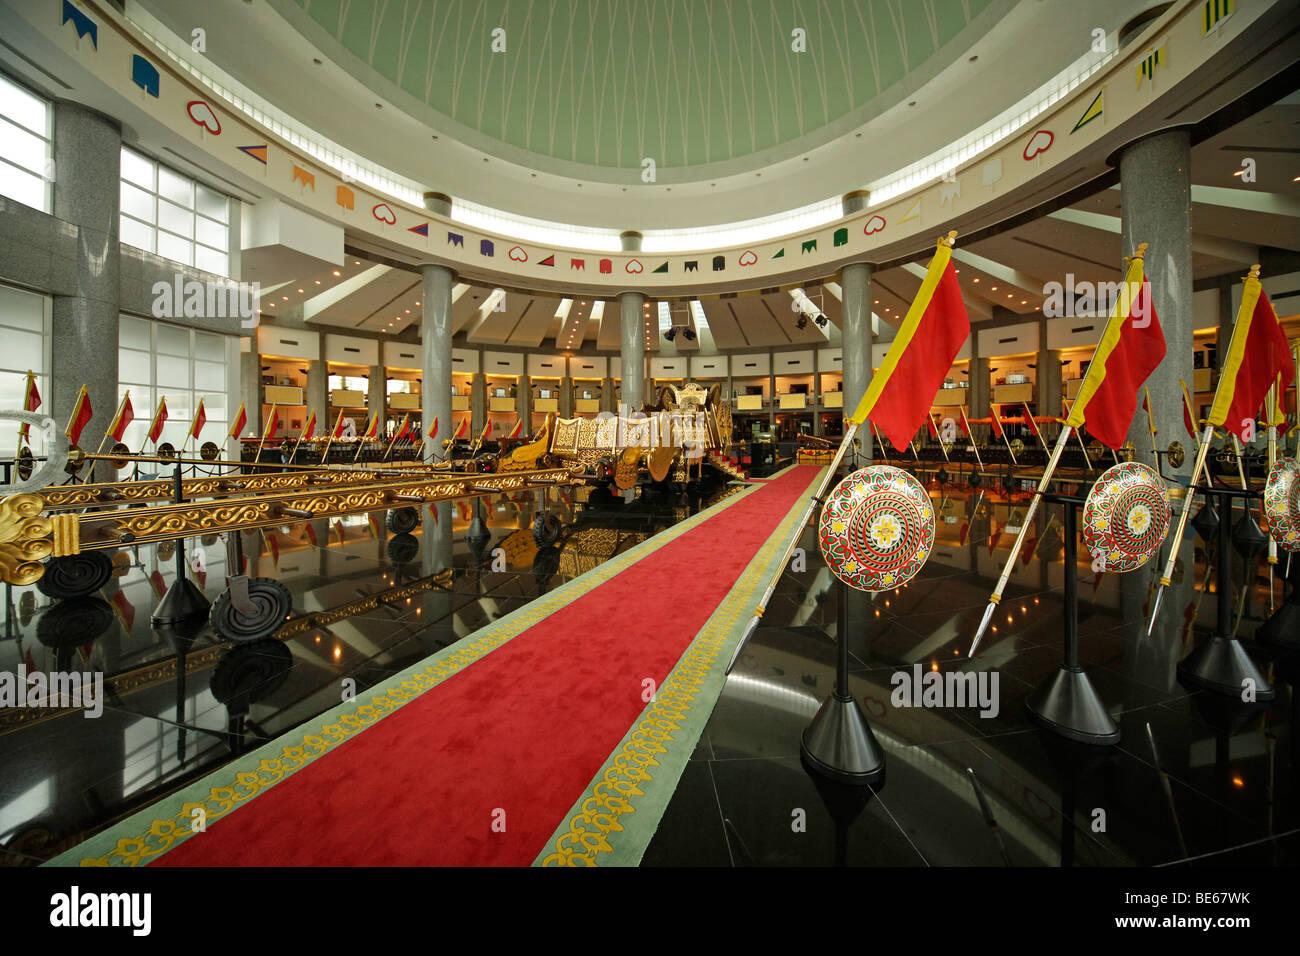 Royal Treasury, Royal Regalia Museum in the capital city, Bandar Seri Begawan, Brunei, Asia - Stock Image